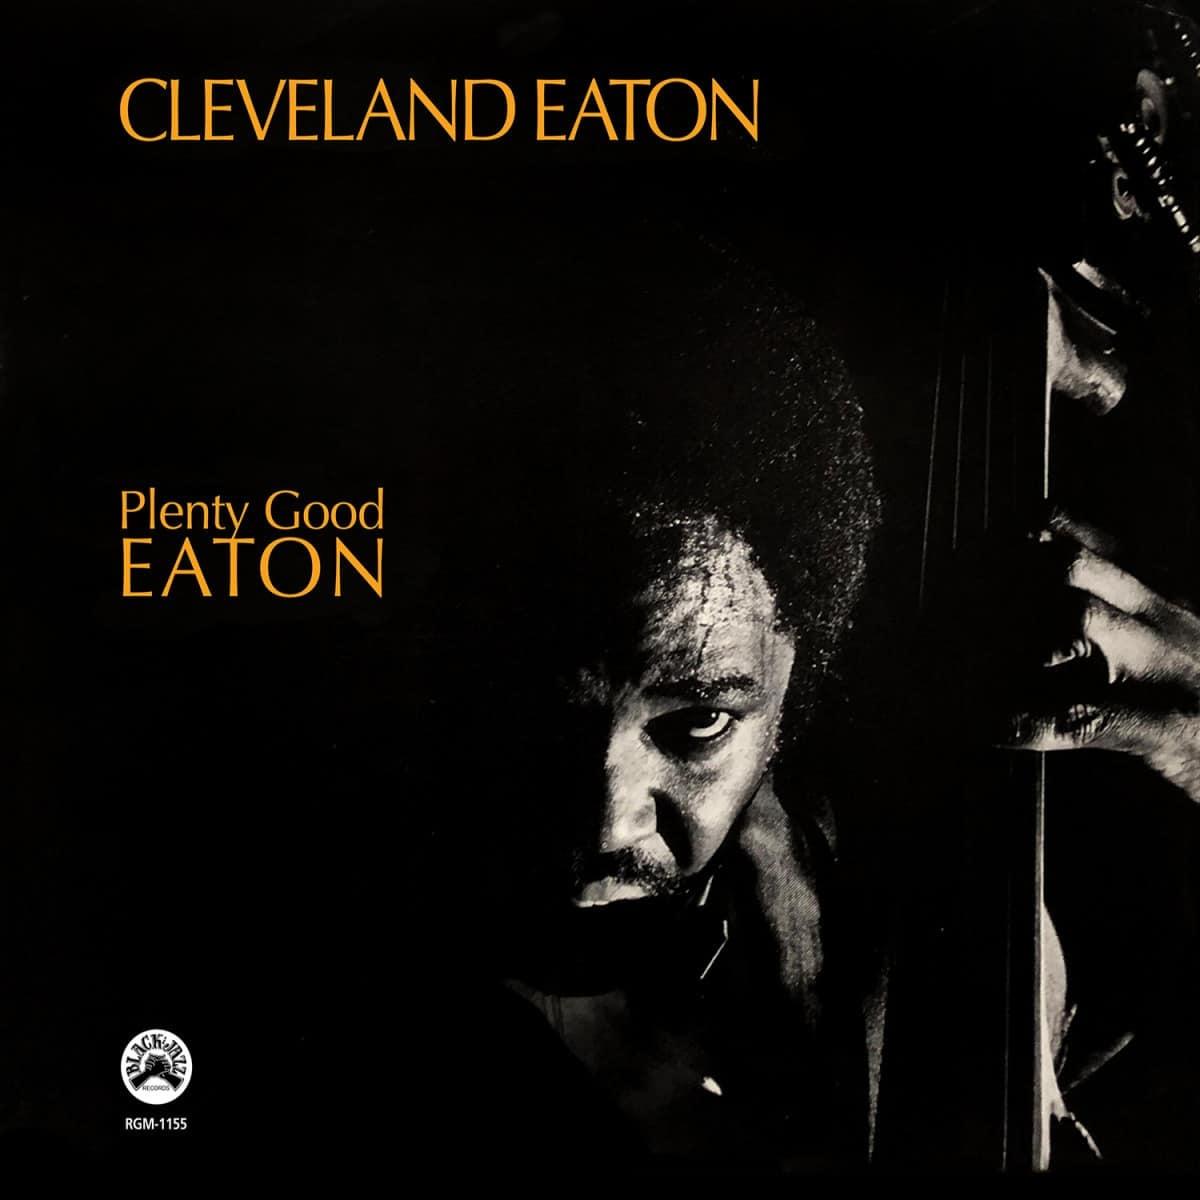 Real Gone Music Cleveland Eaton - Plenty Good Eaton